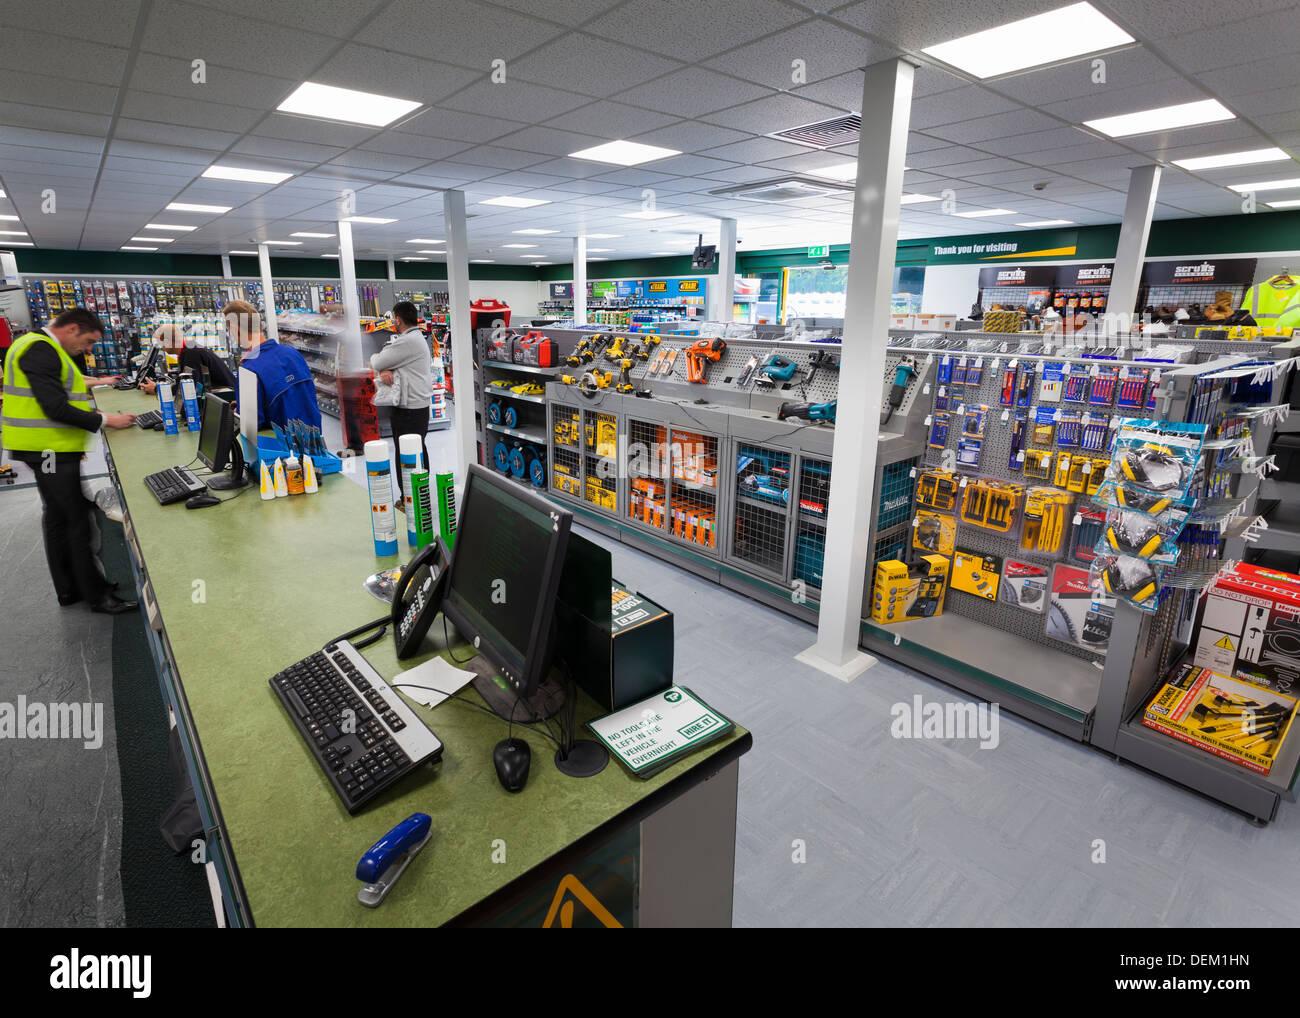 customers at sales counter in Travis Perkins Builders Merchants shop - Stock Image